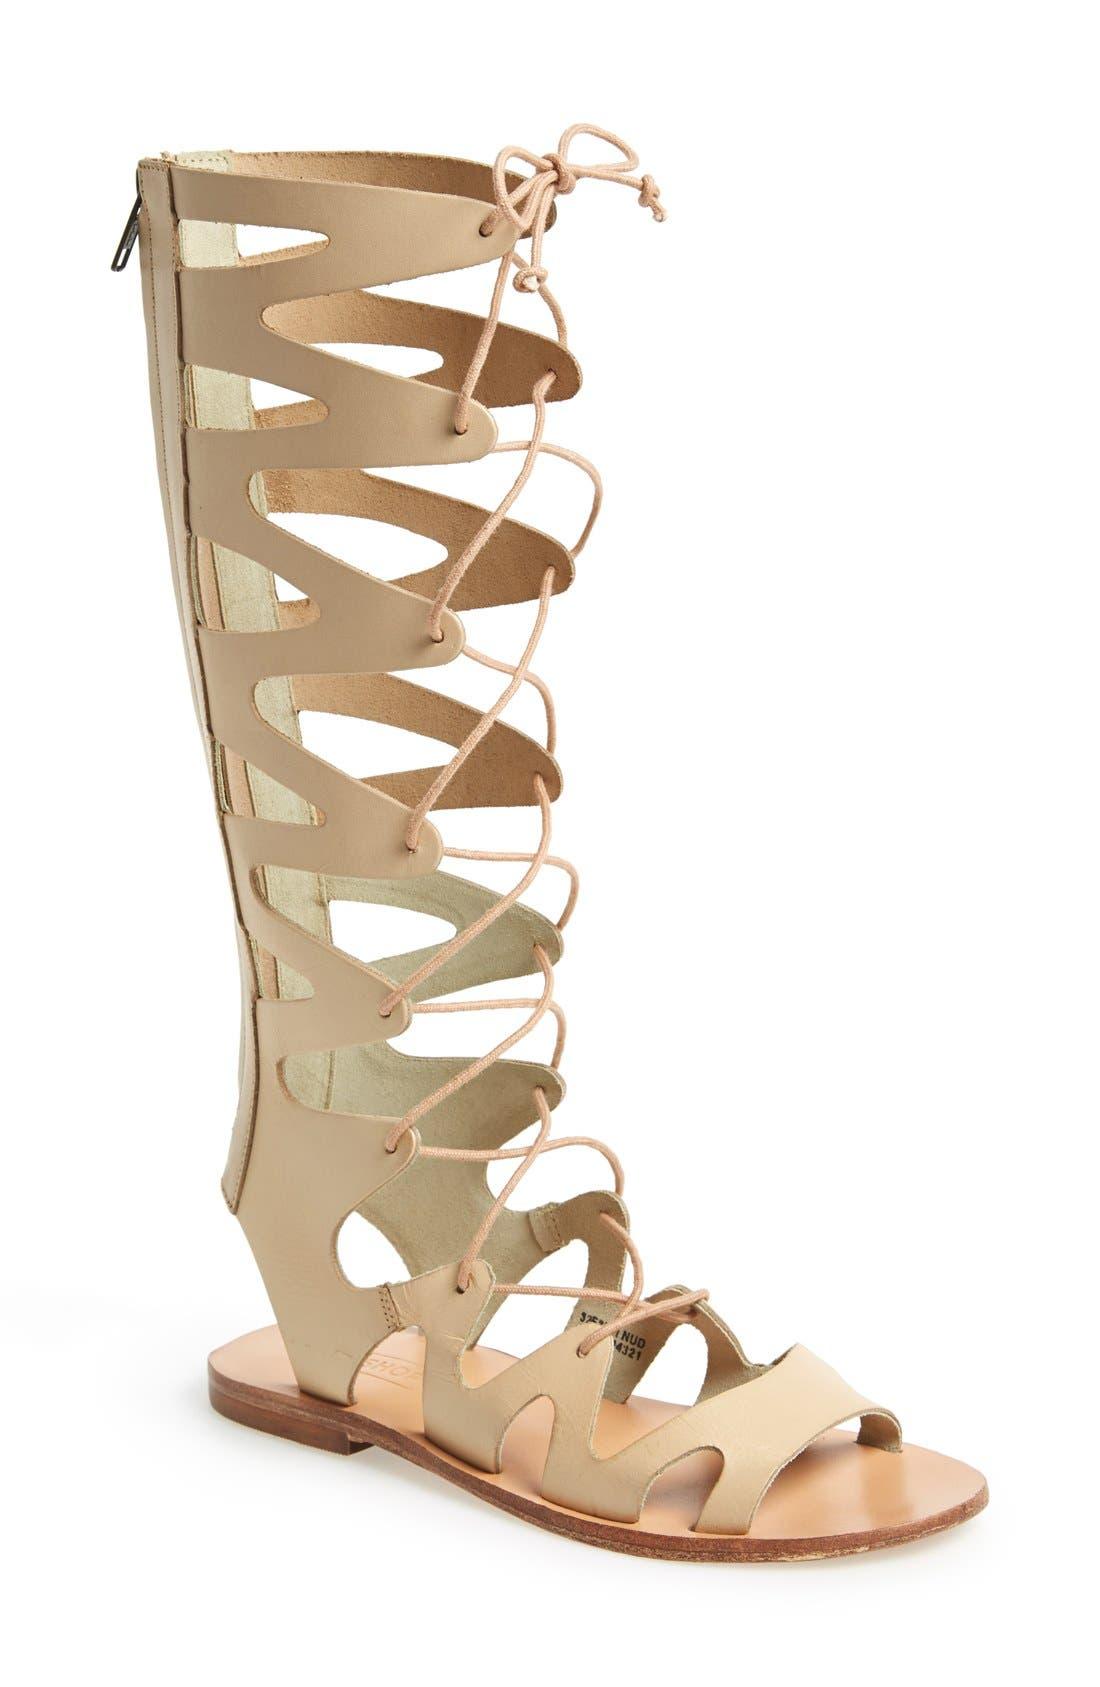 Main Image - Topshop 'Figtree' Leather Gladiator Sandal (Women)